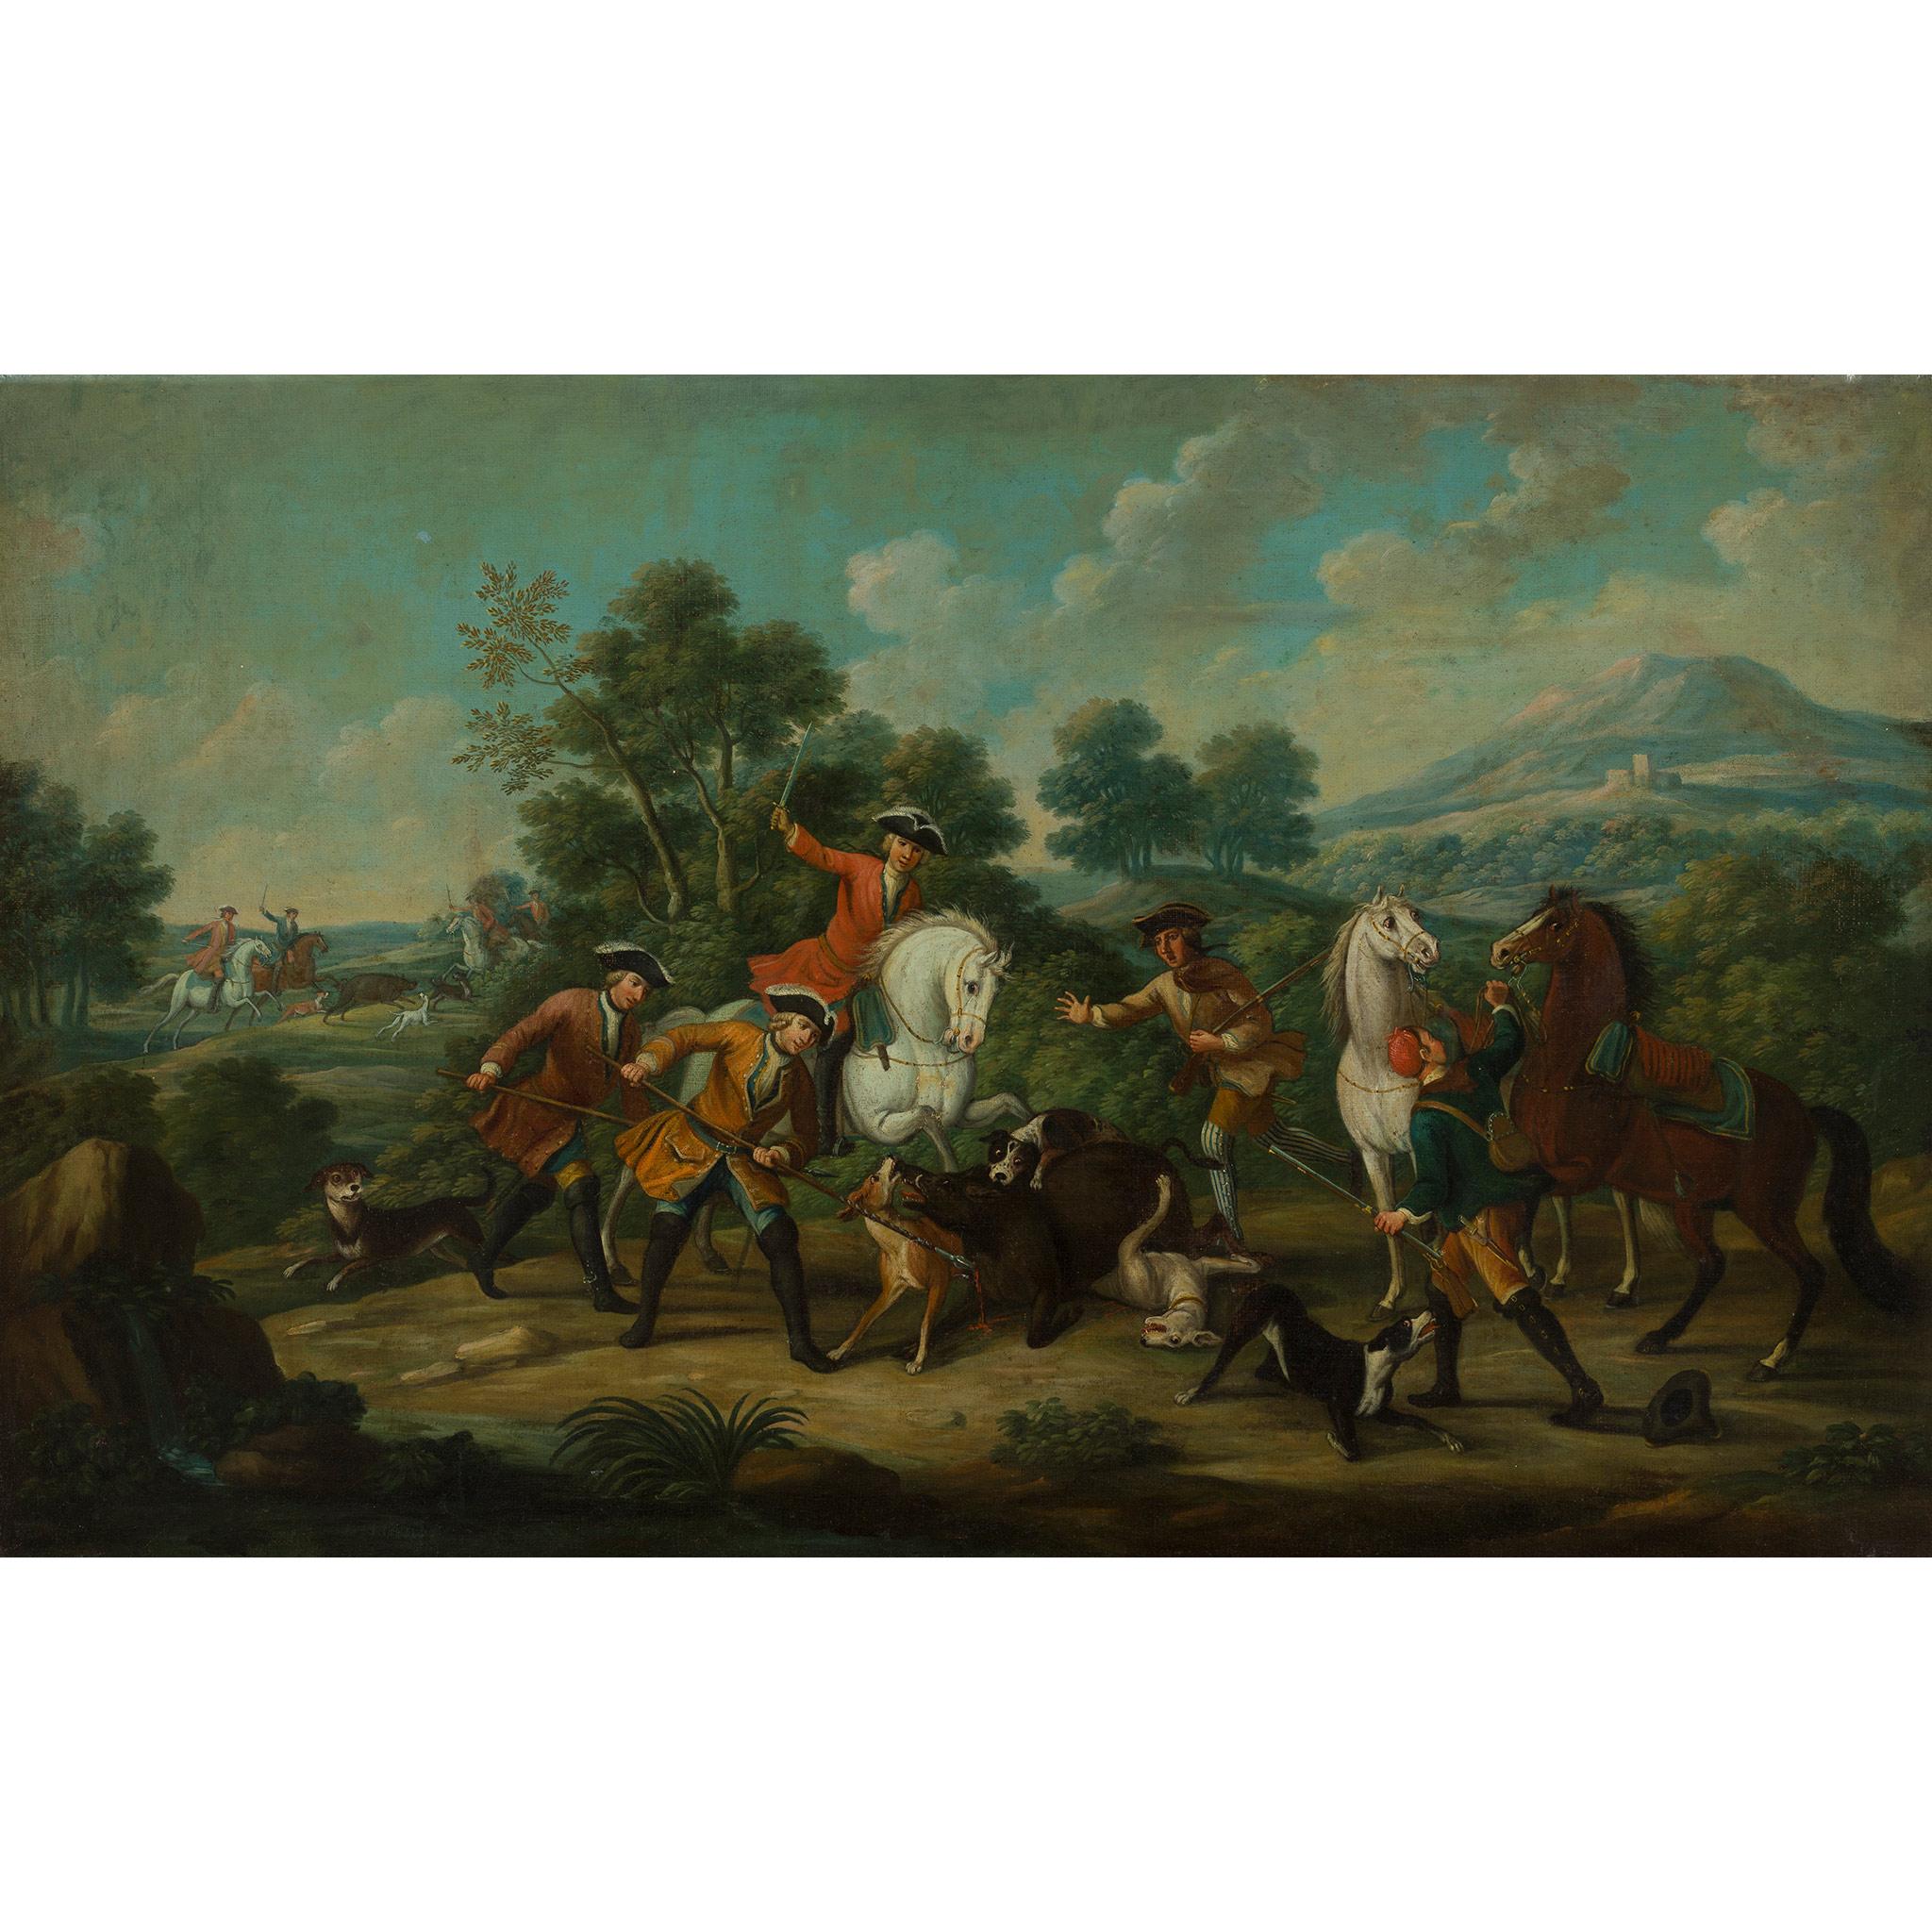 18TH CENTURY FRENCH SCHOOL ELEGANT FIGURES BOAR HUNTING - Image 3 of 8